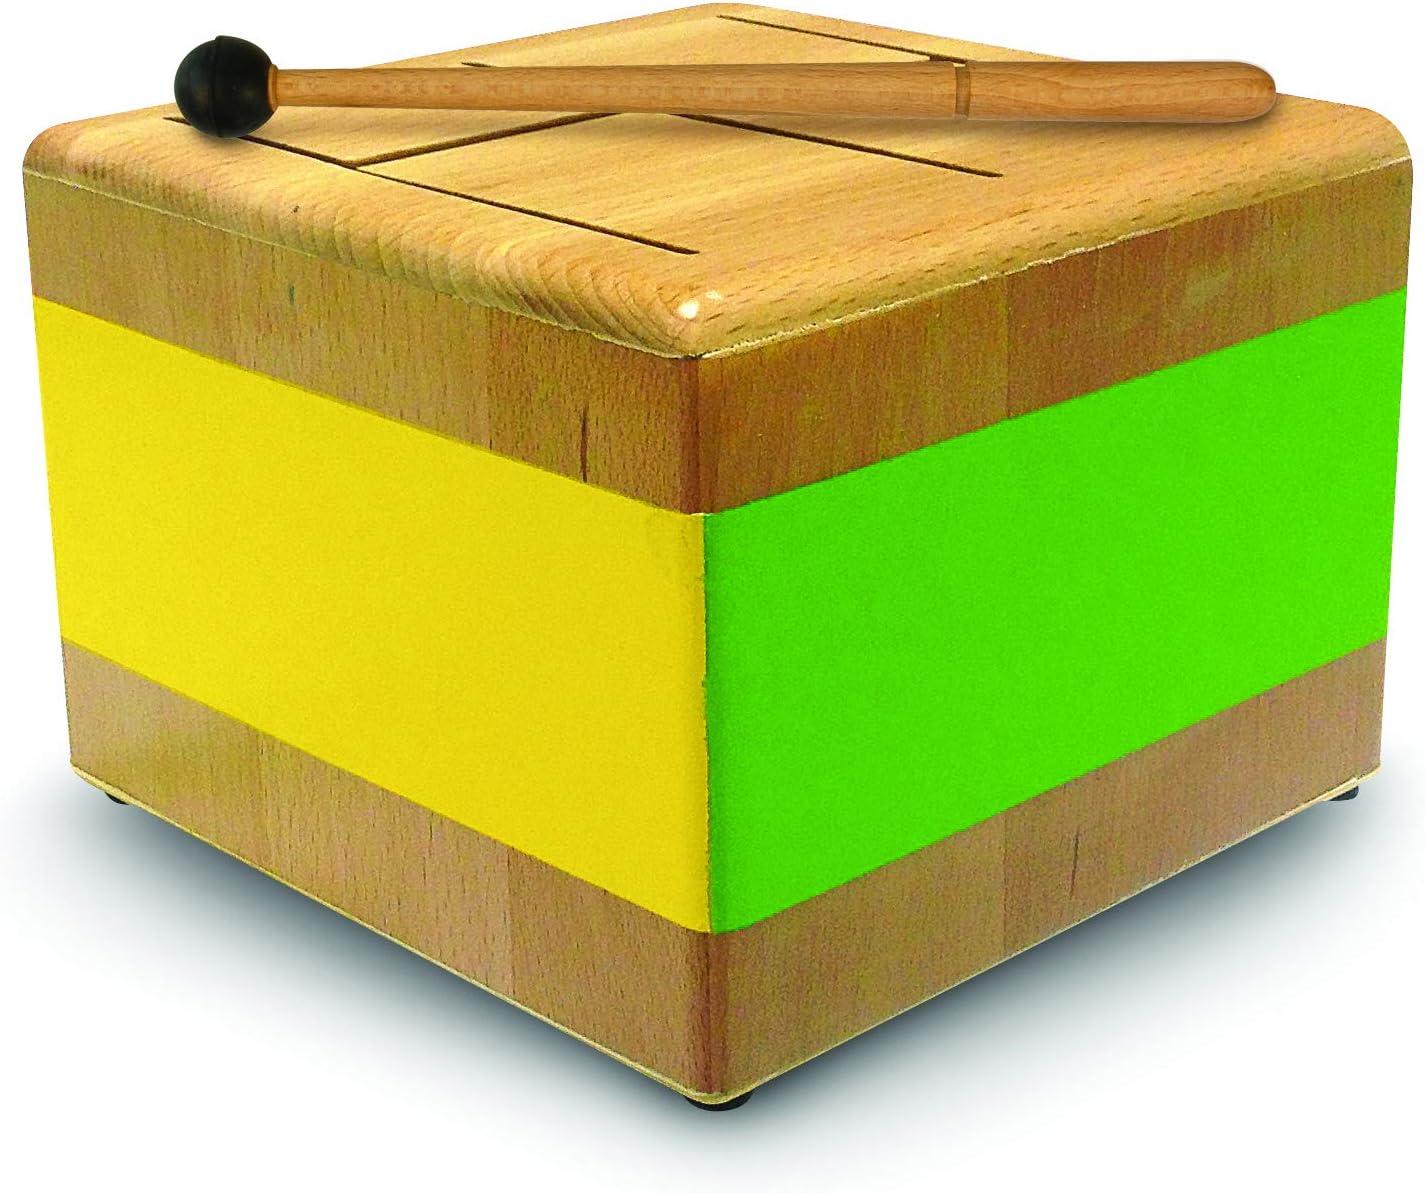 Hohner Green Washington Mall Tones Tone 3770 Drum Super popular specialty store